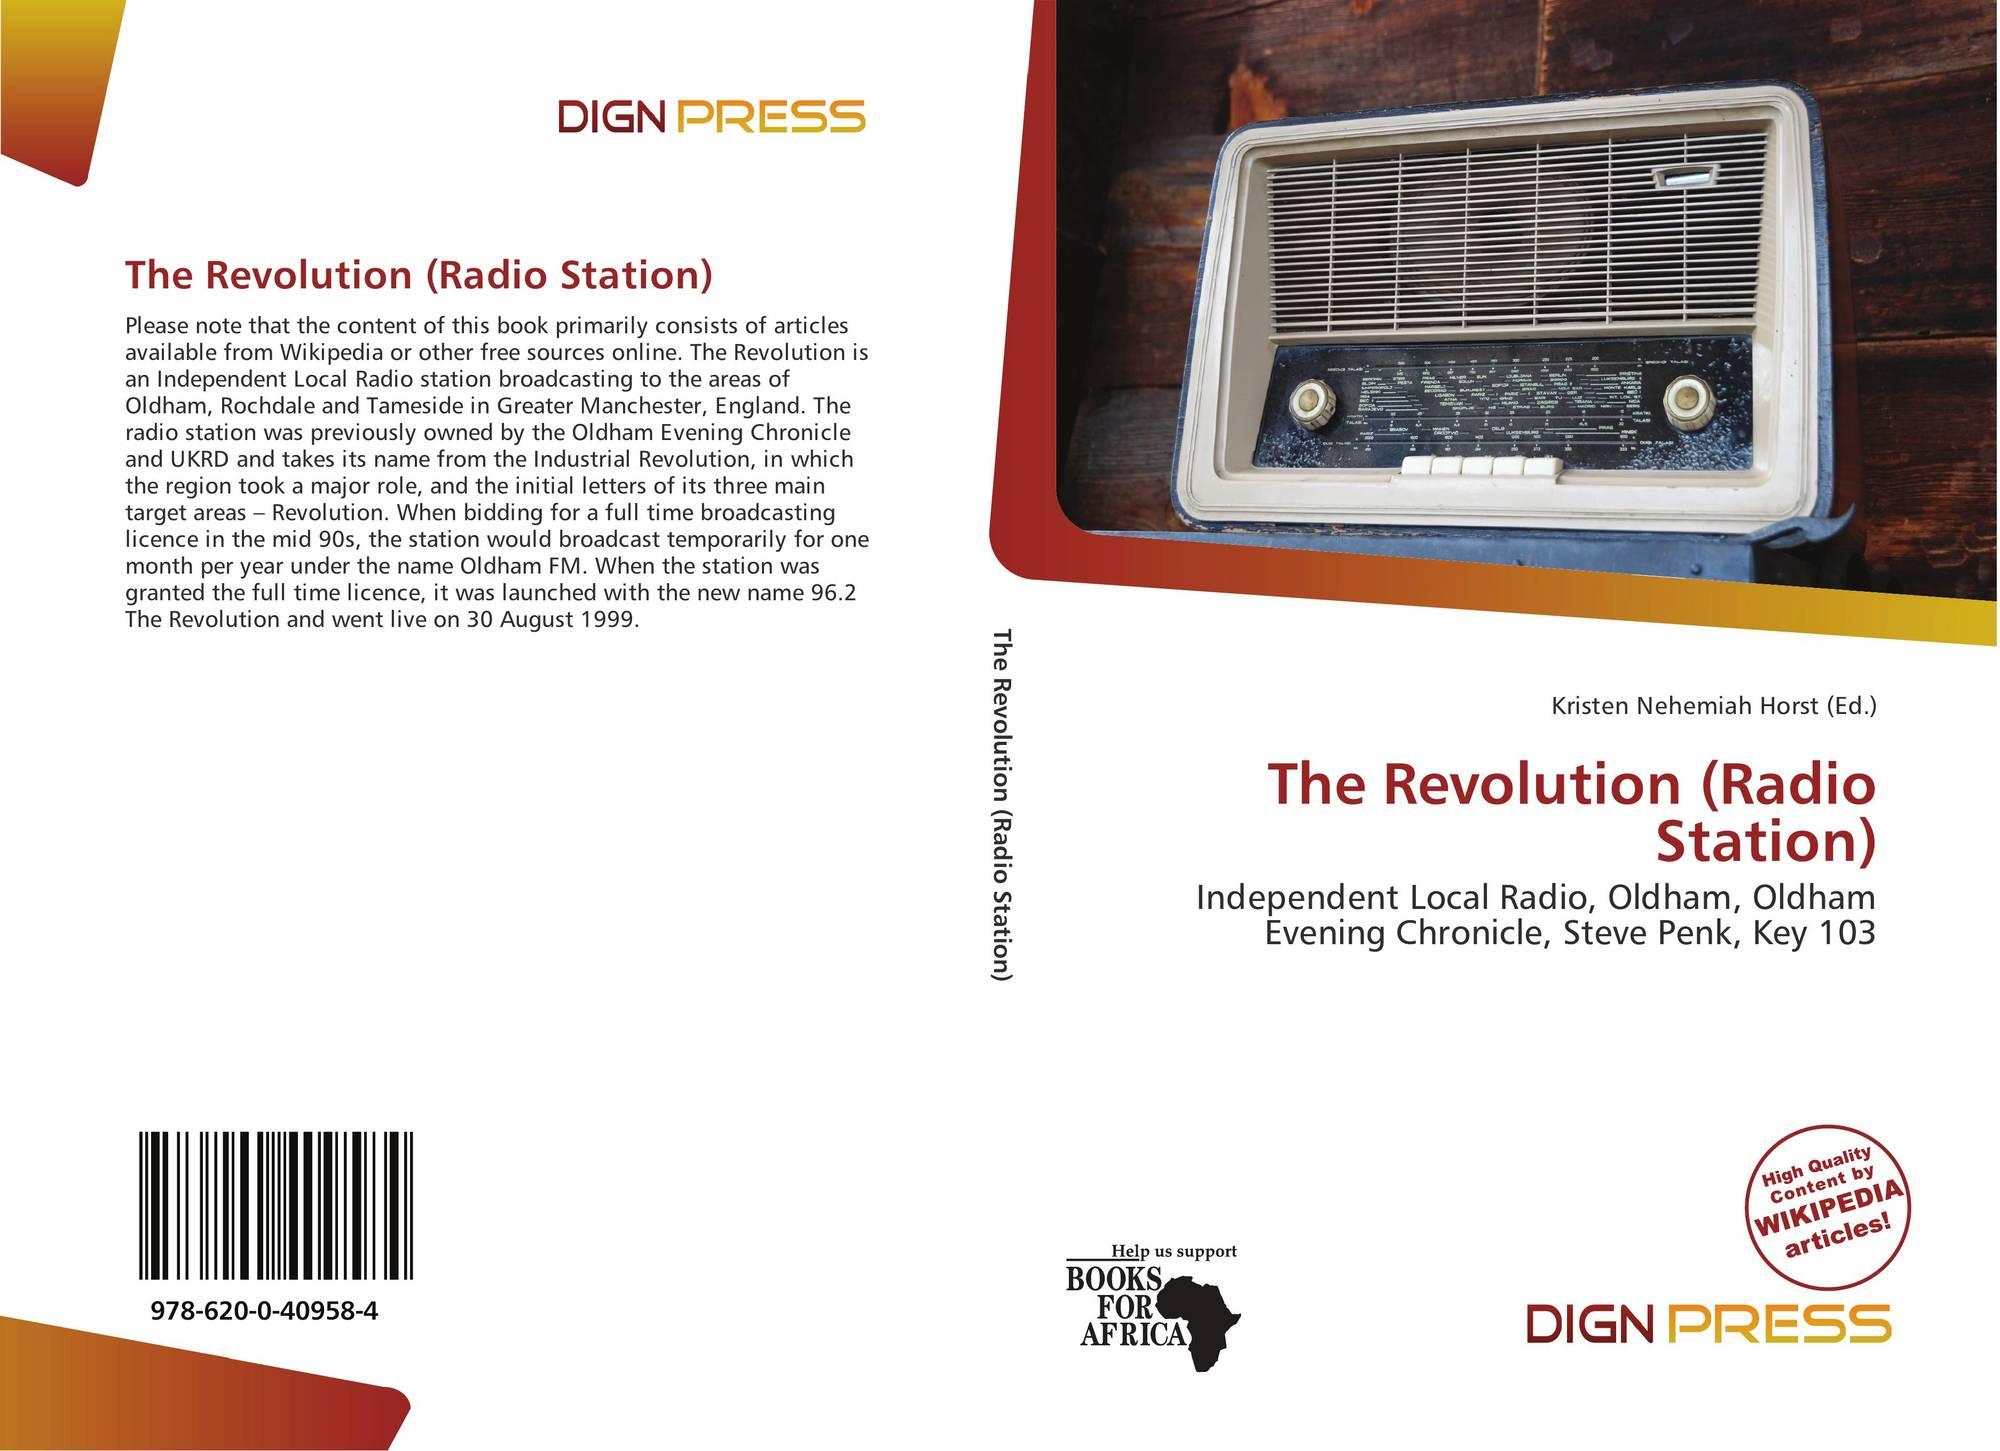 The Revolution (Radio Station), 978-620-0-40958-4, 6200409587